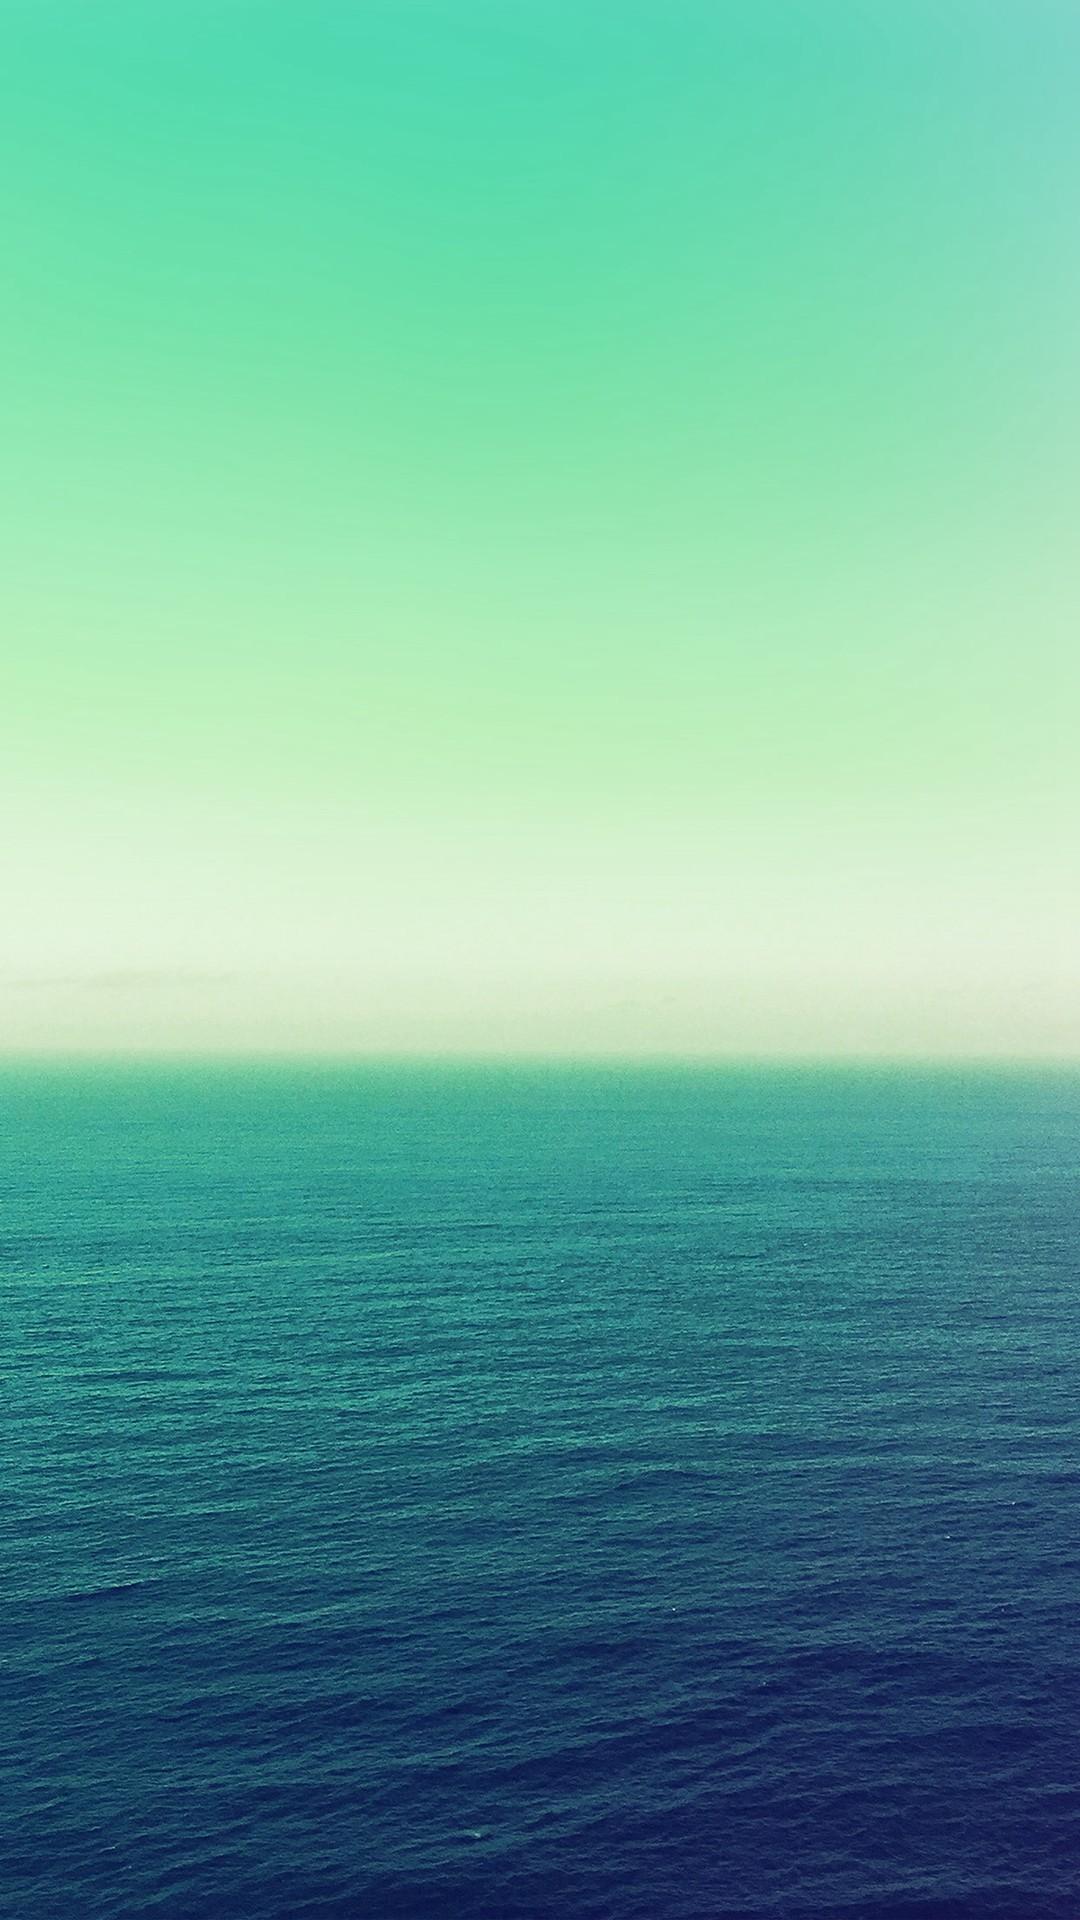 Calm Sea Green Ocean Water Summer Day Nature #iPhone #6 #wallpaper